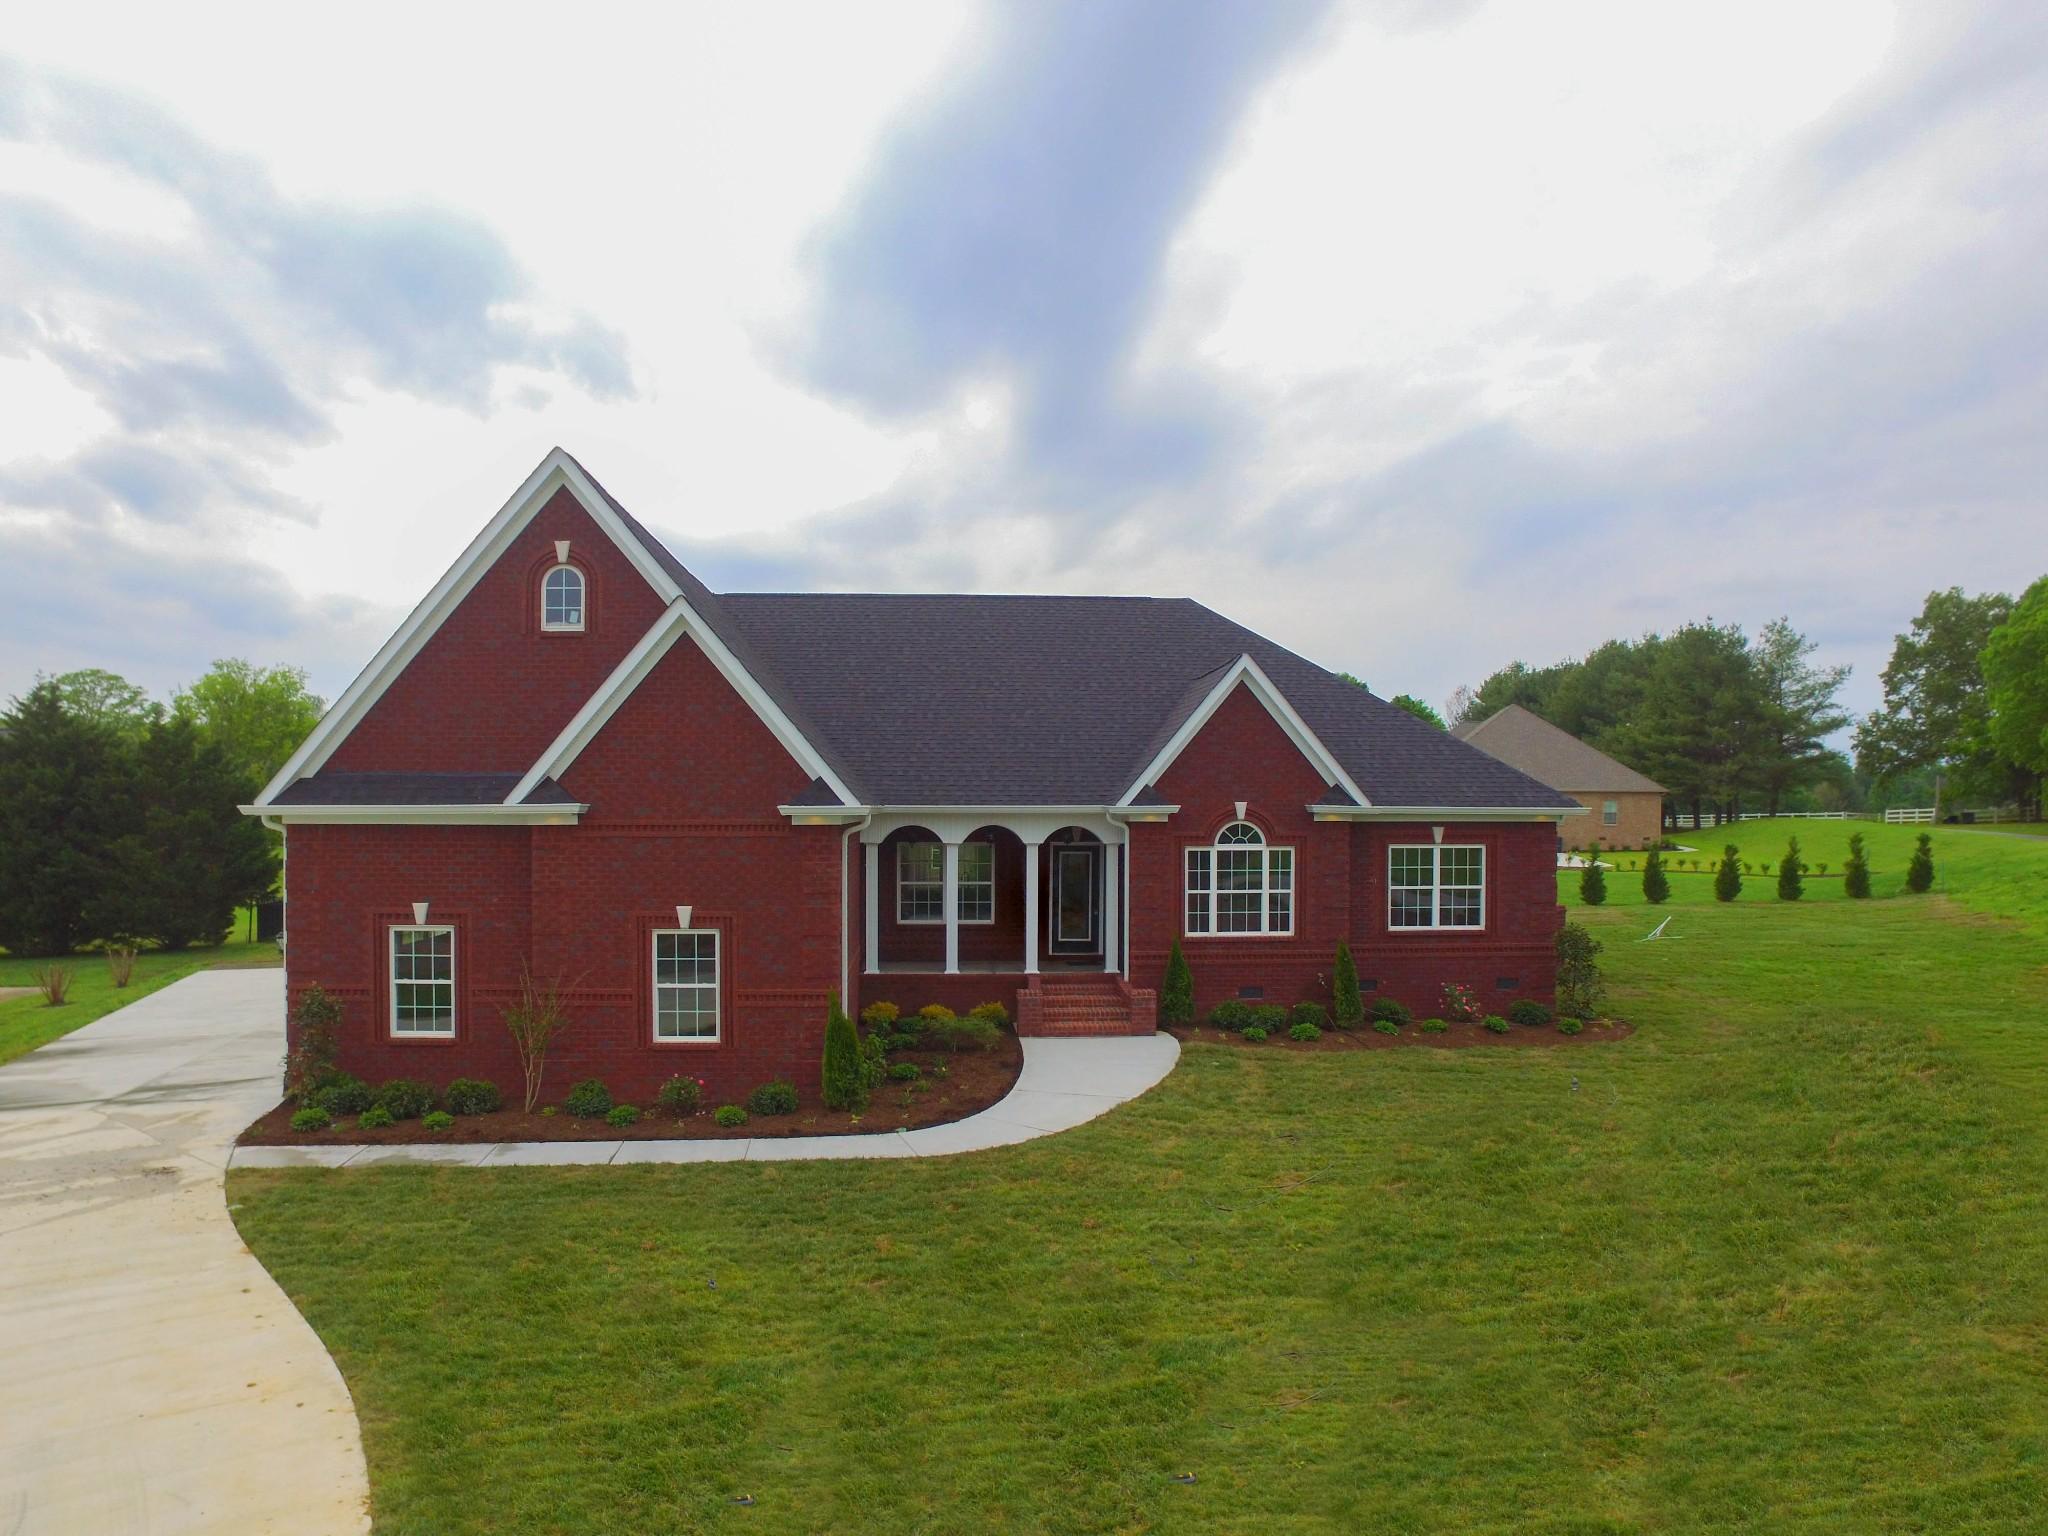 100 Highpoint Blvd, Tullahoma, TN 37388 - Tullahoma, TN real estate listing